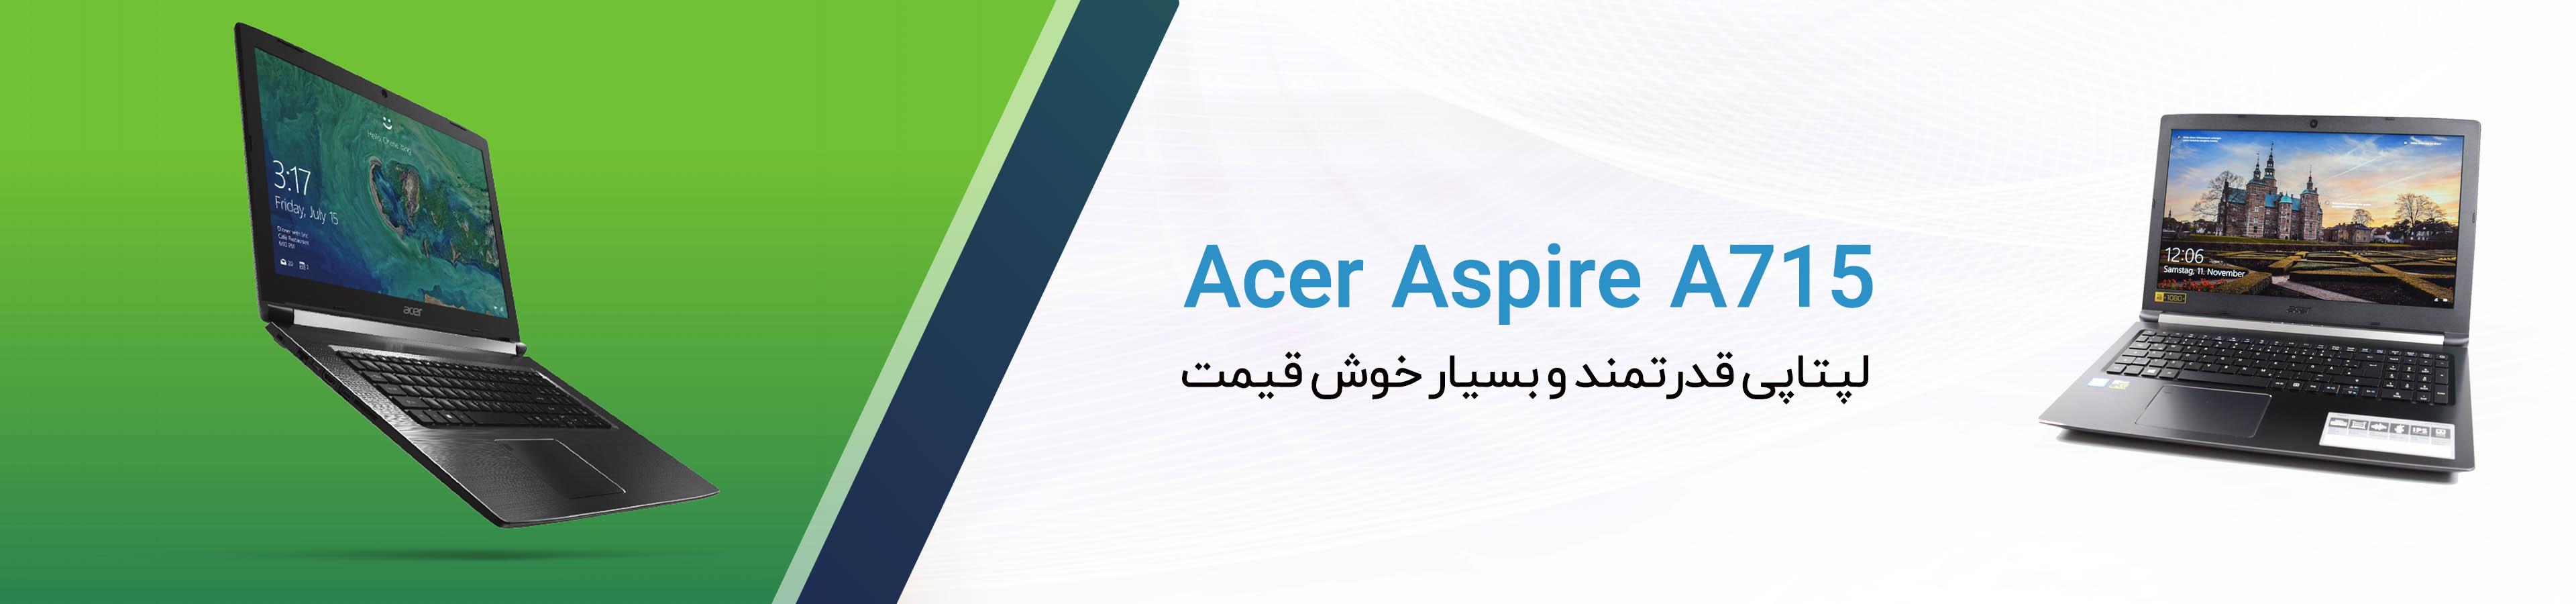 Acer A715